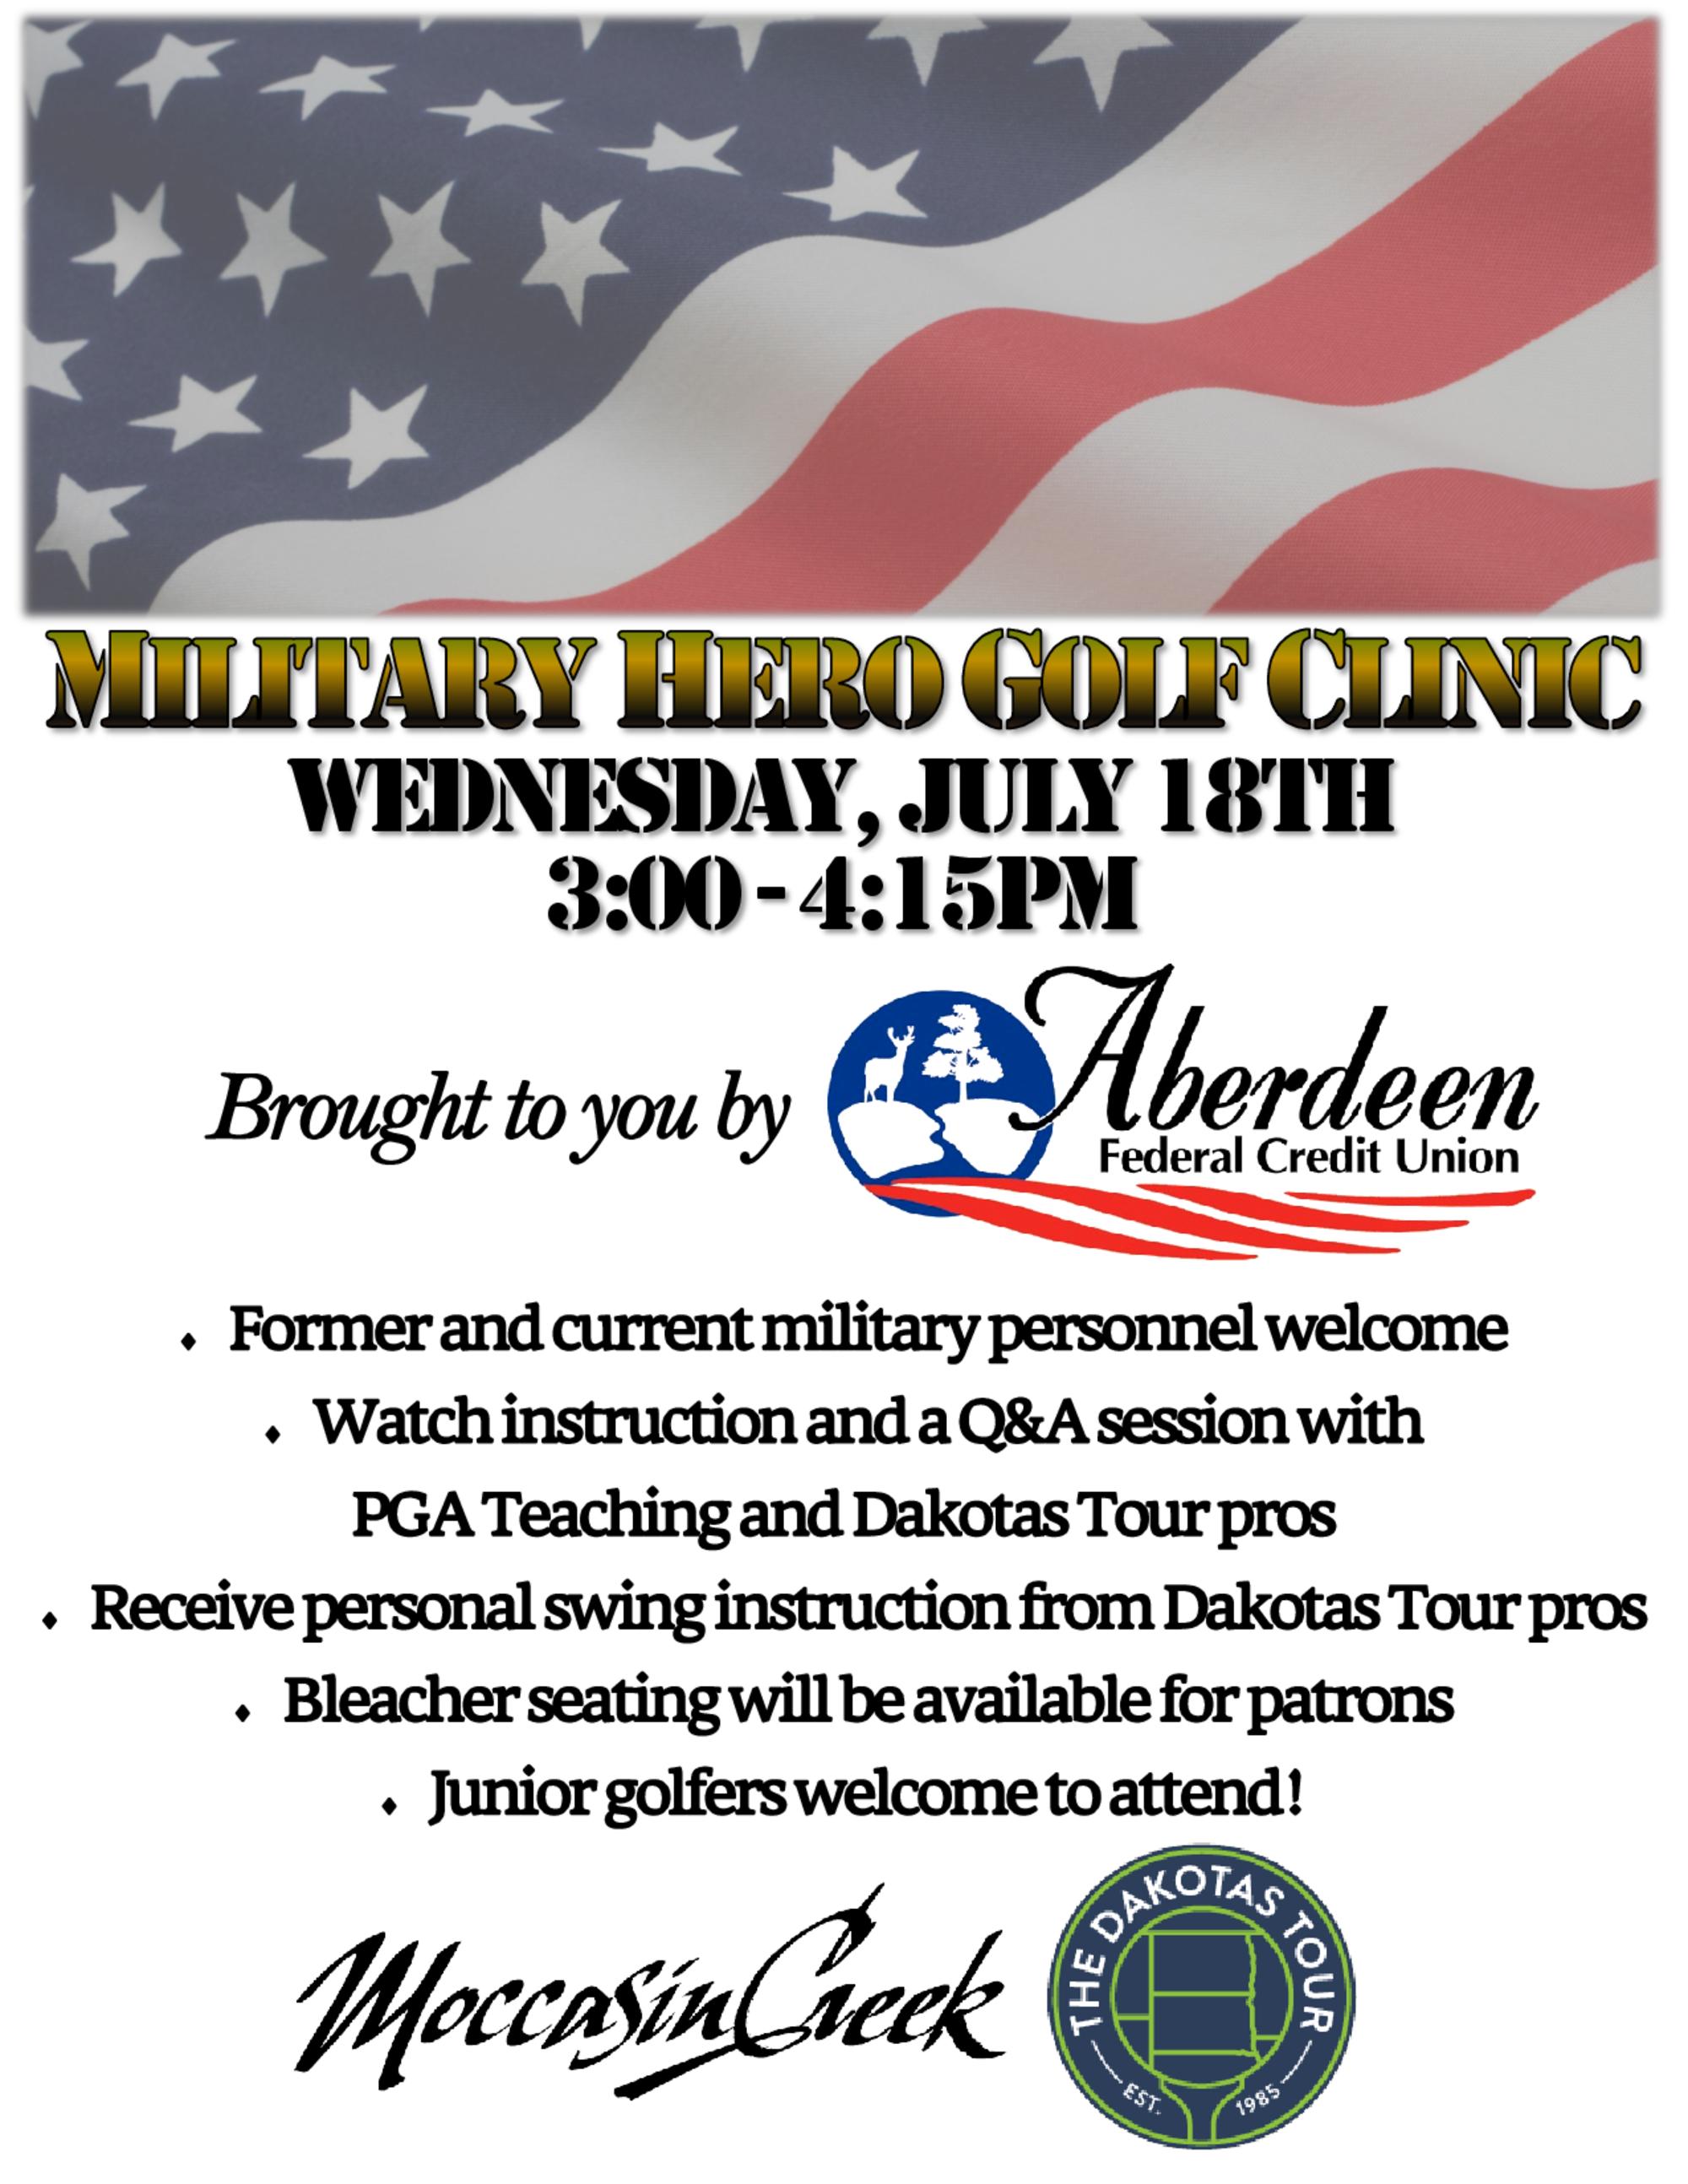 Pro am military hero golf clinic 2018 flyer 1